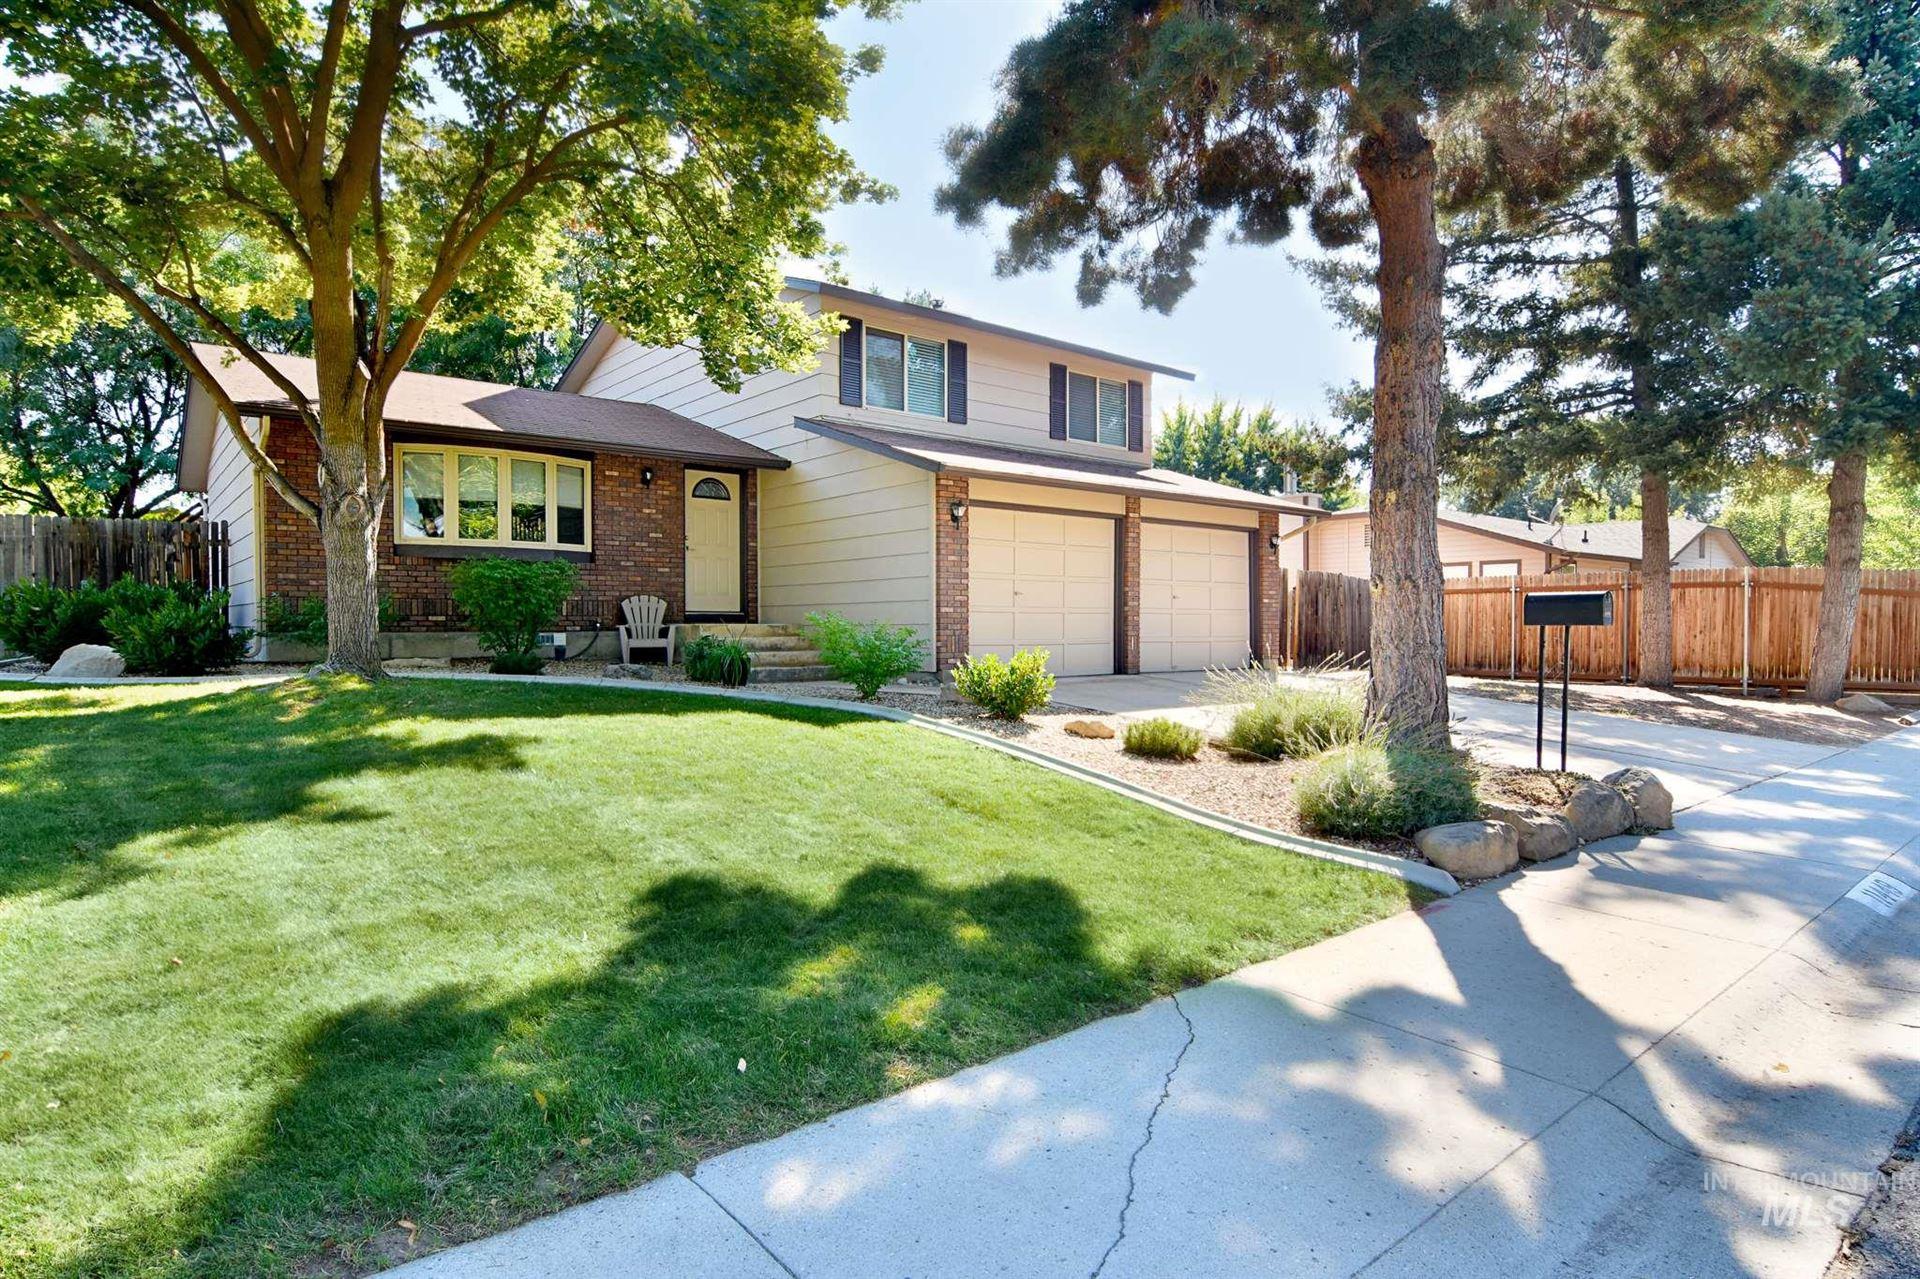 14499 W Powderhorn St, Boise, ID 83713 - MLS#: 98779583